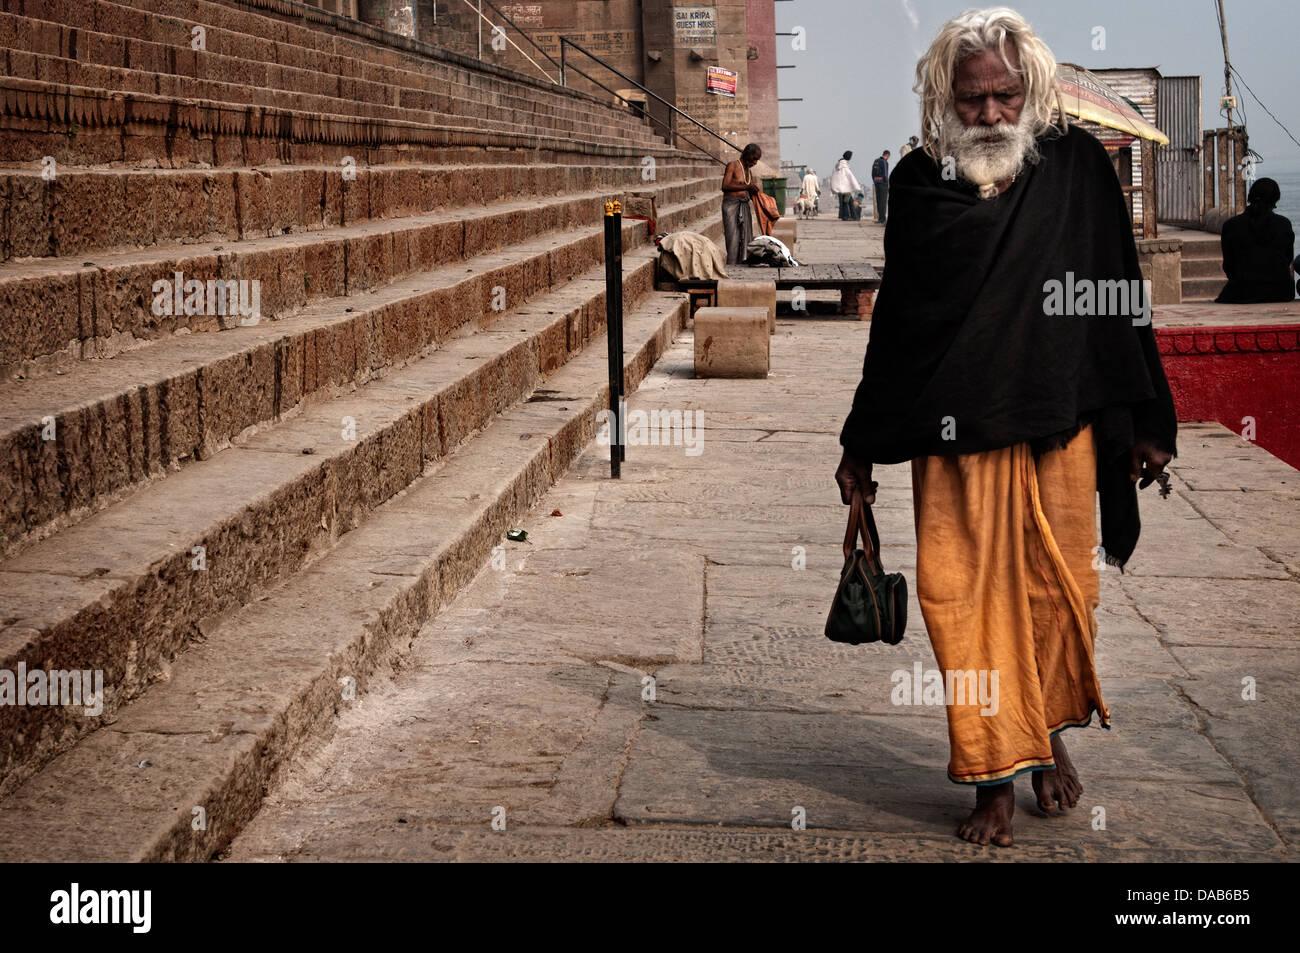 Sadhu walking on the ghats. Varanasi, Benares, Uttar Pradesh, India - Stock Image